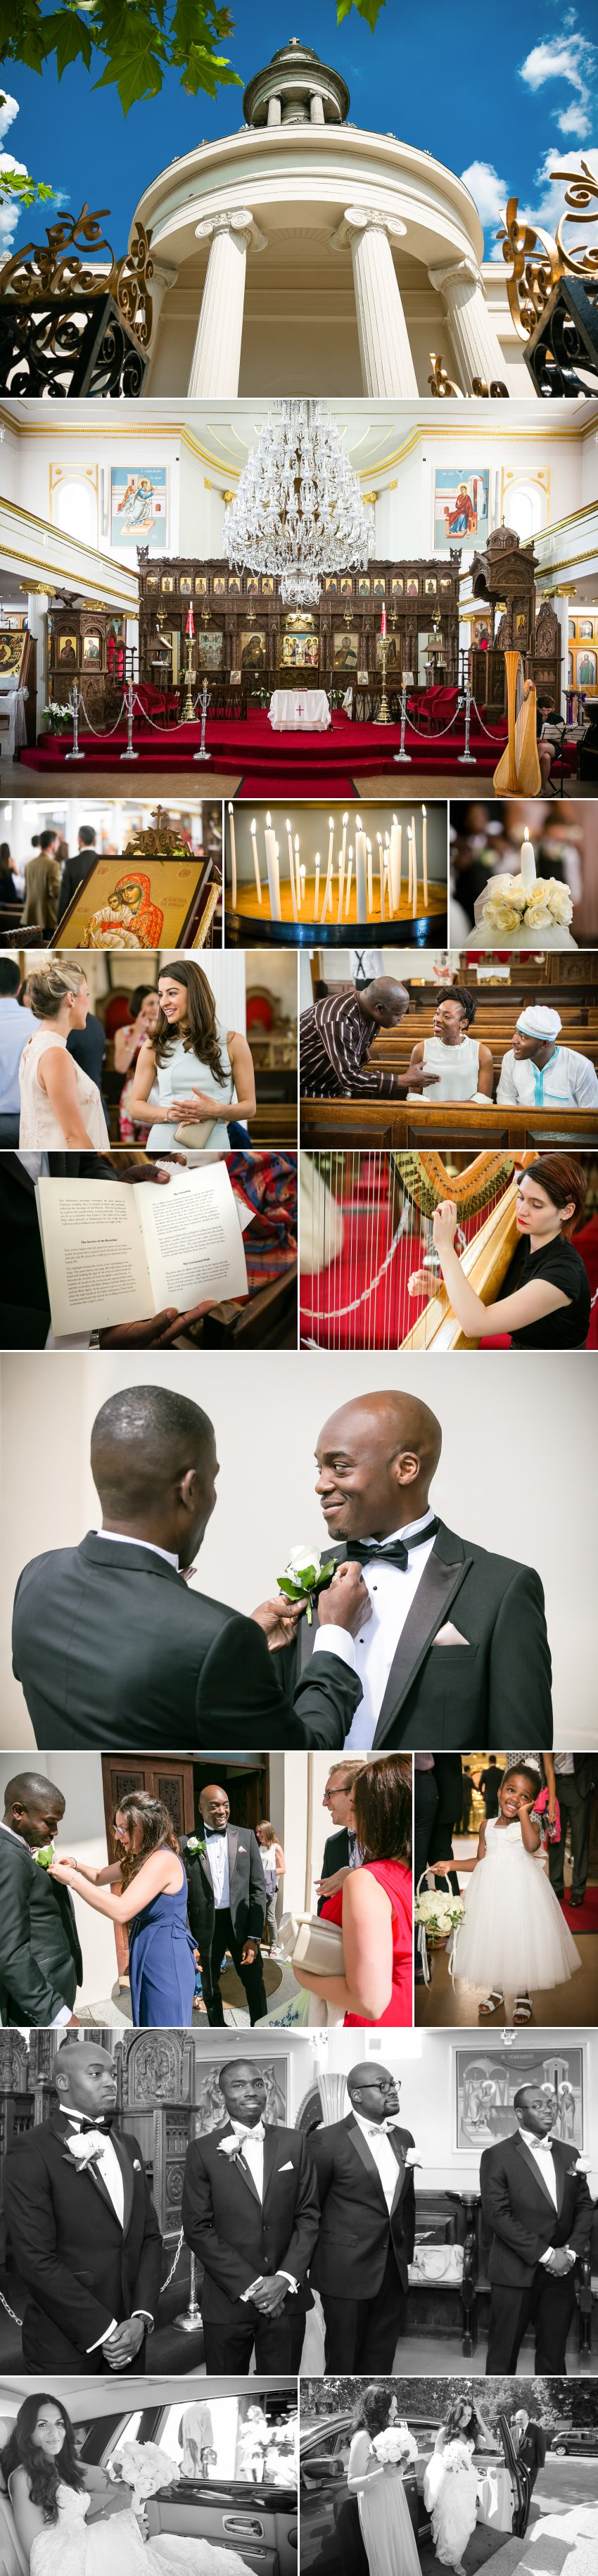 07 Nigerian wedding at Rosewood Hotel